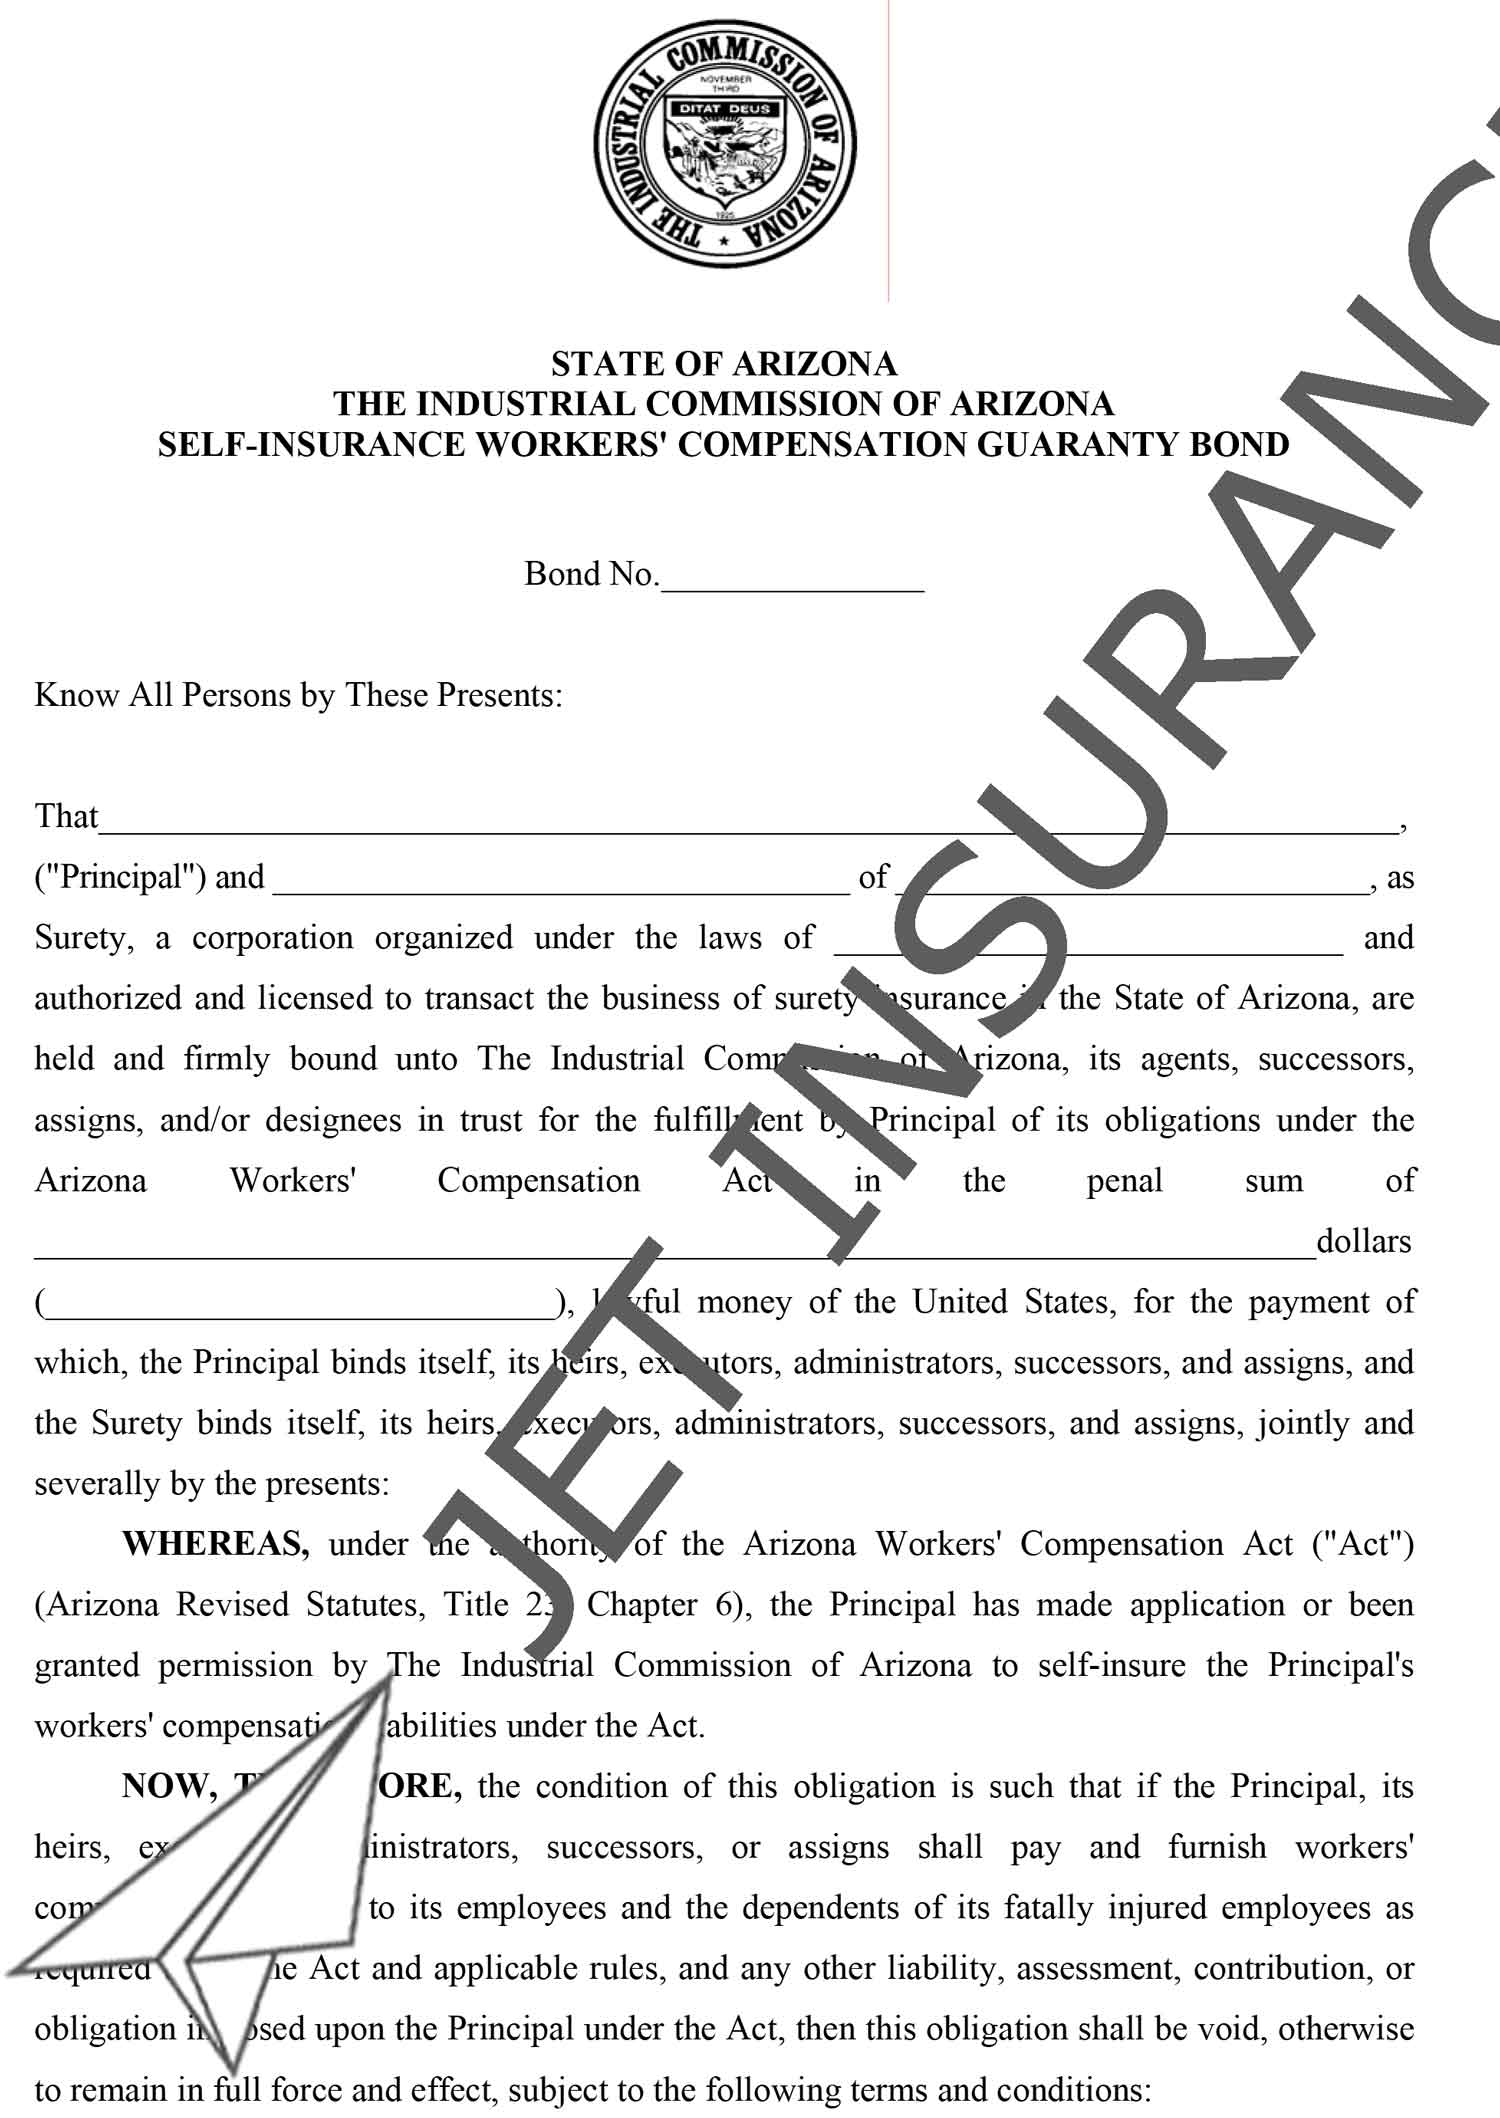 Arizona Self-Insurance Workers' Compensation Guaranty Bond Form